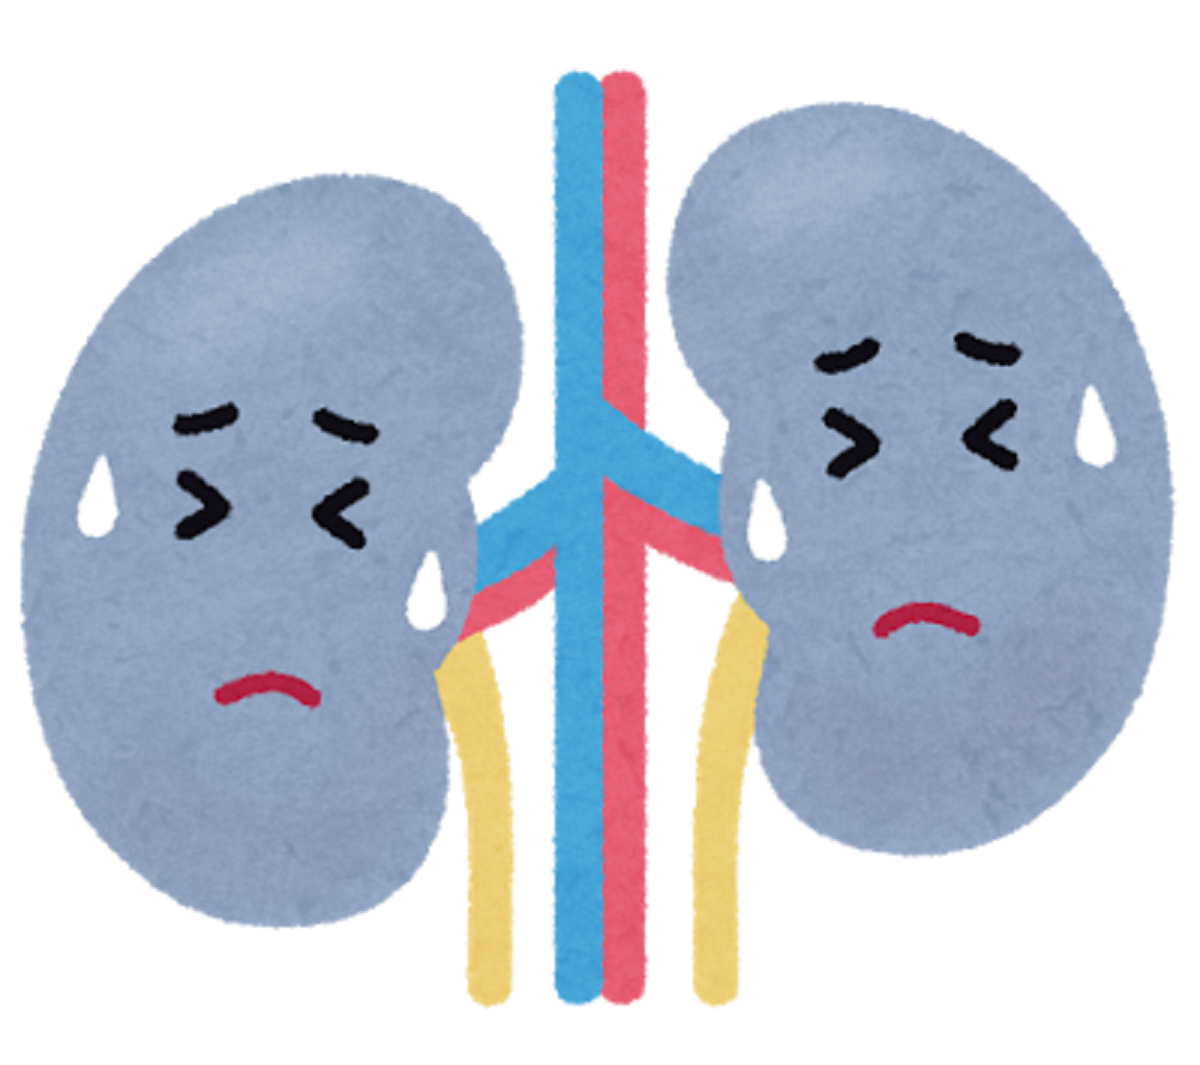 SGLT2阻害薬と腎機能~各薬剤の添付文書上の共通部分と違いについて~